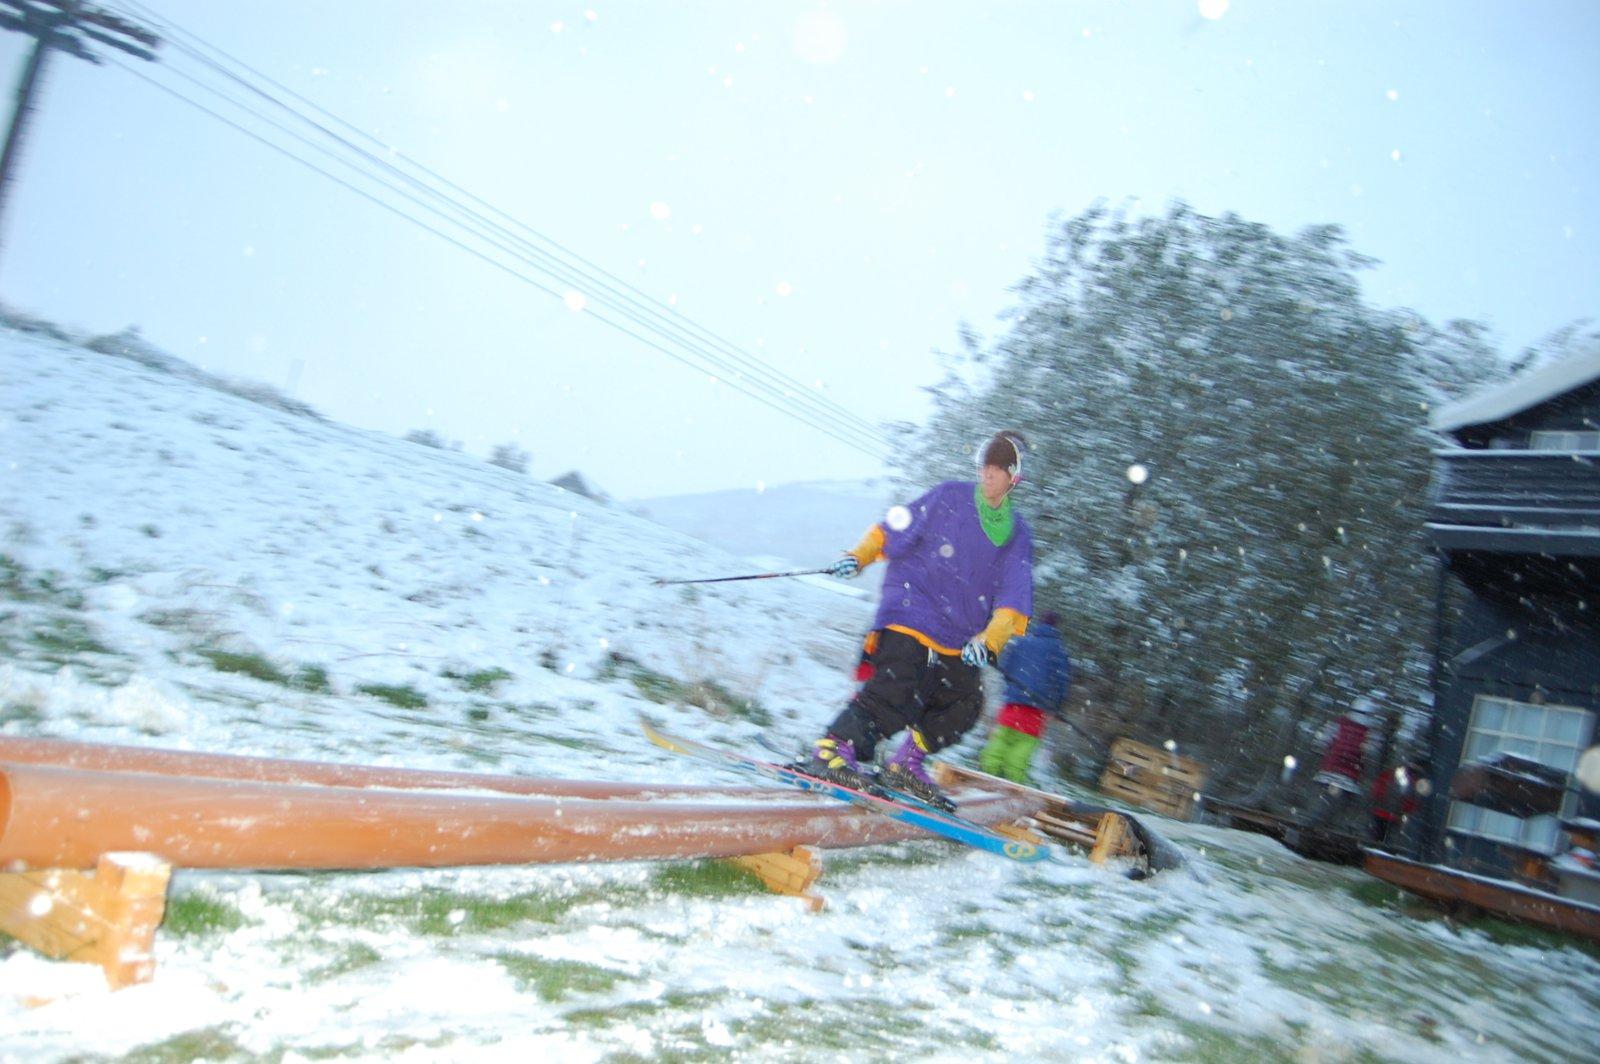 First railjam on snow this season